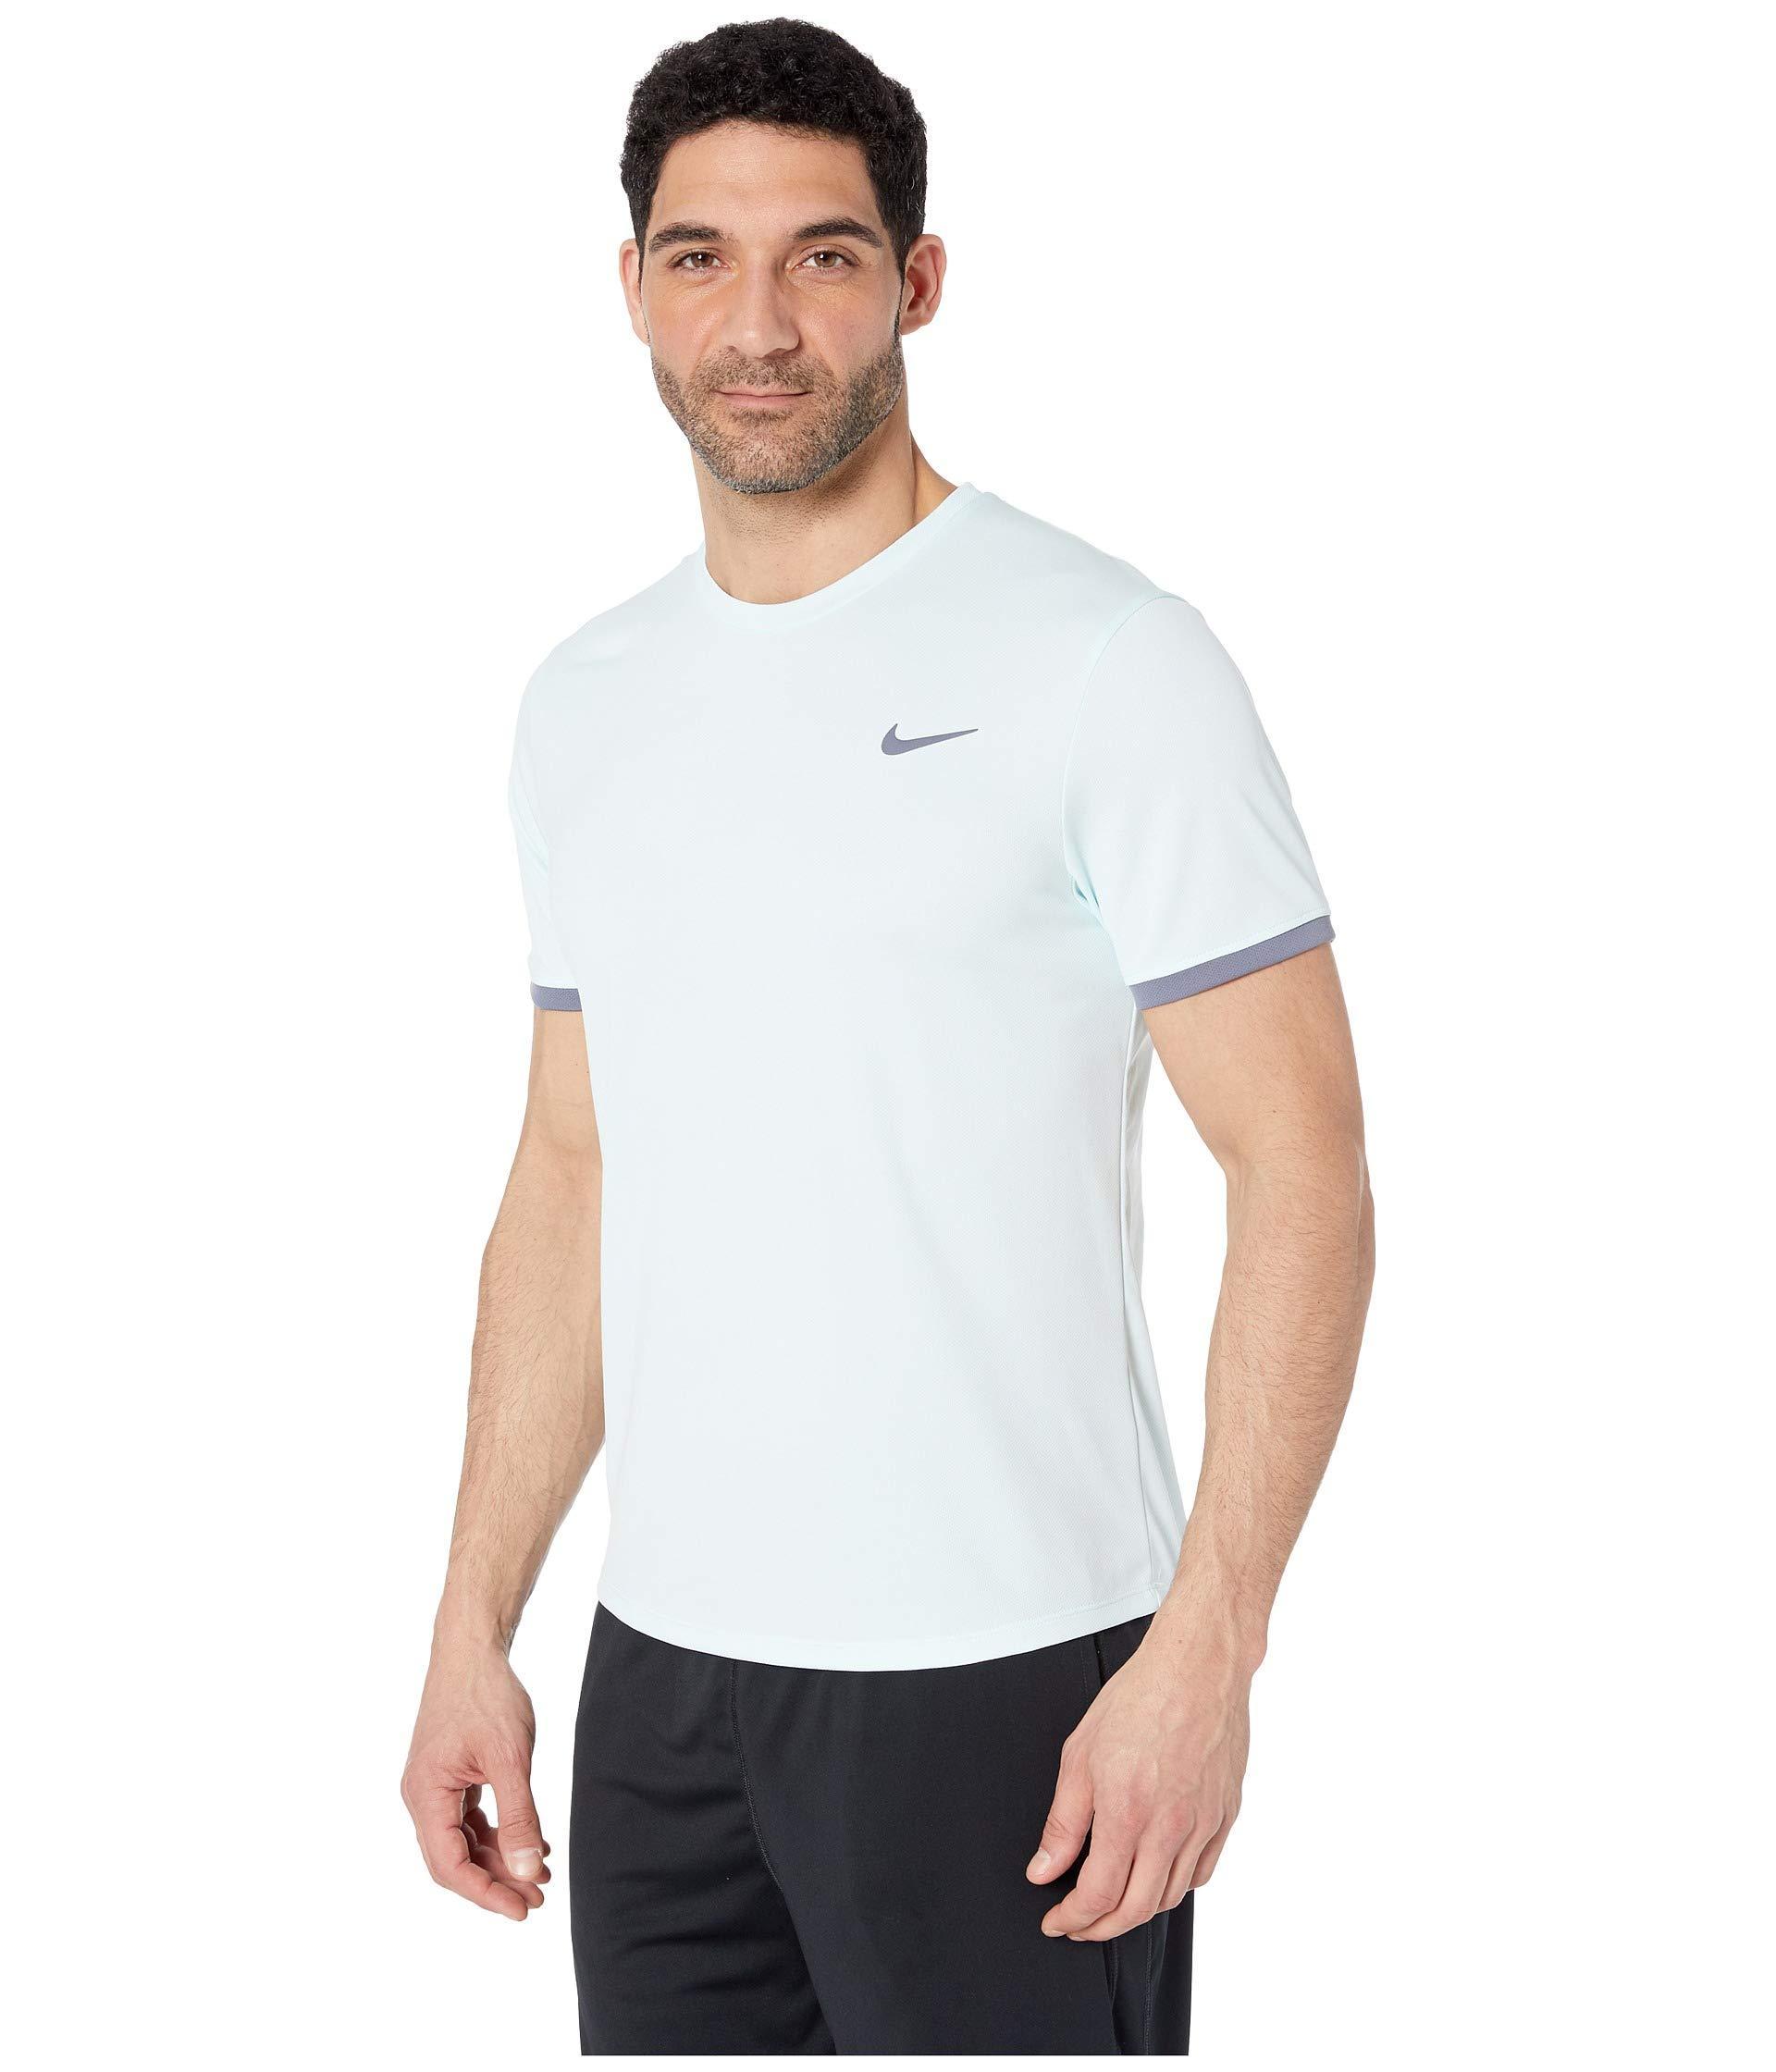 cd32fbd8b2b8 Lyst - Nike Court Dri-fit Short Sleeve Tennis Top (light  Carbon gridiron light Carbon) Men s Clothing in Black for Men